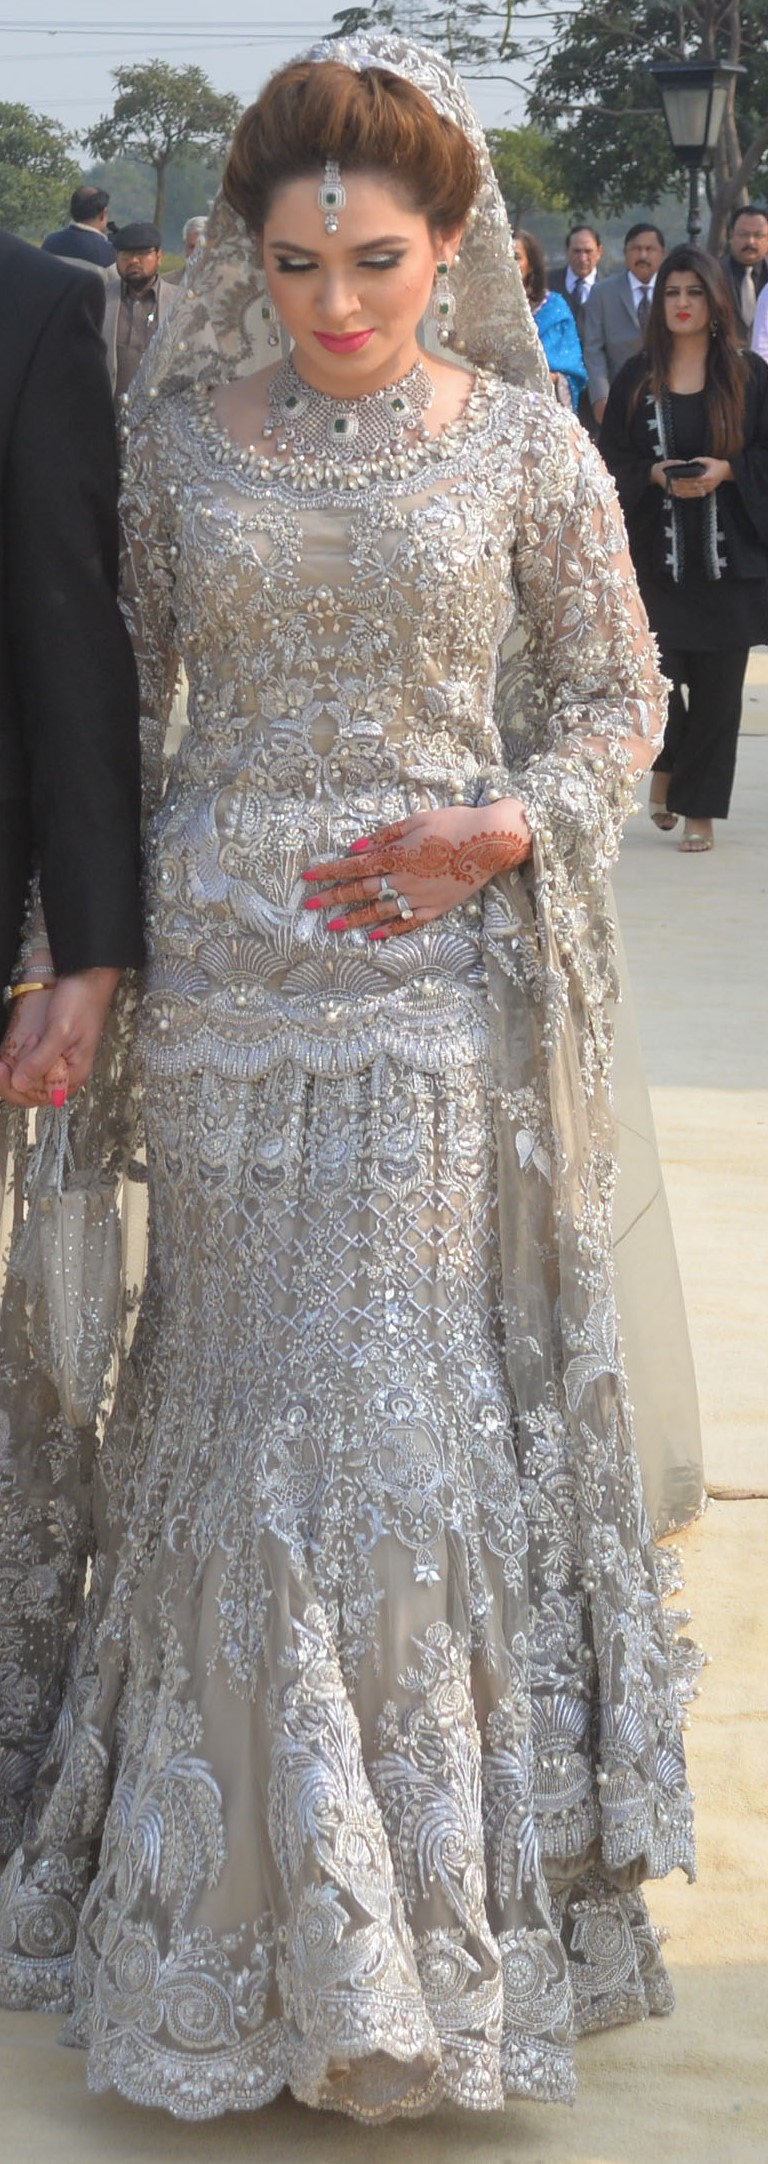 Jia Habib - A true princess at her wedding in Elan!